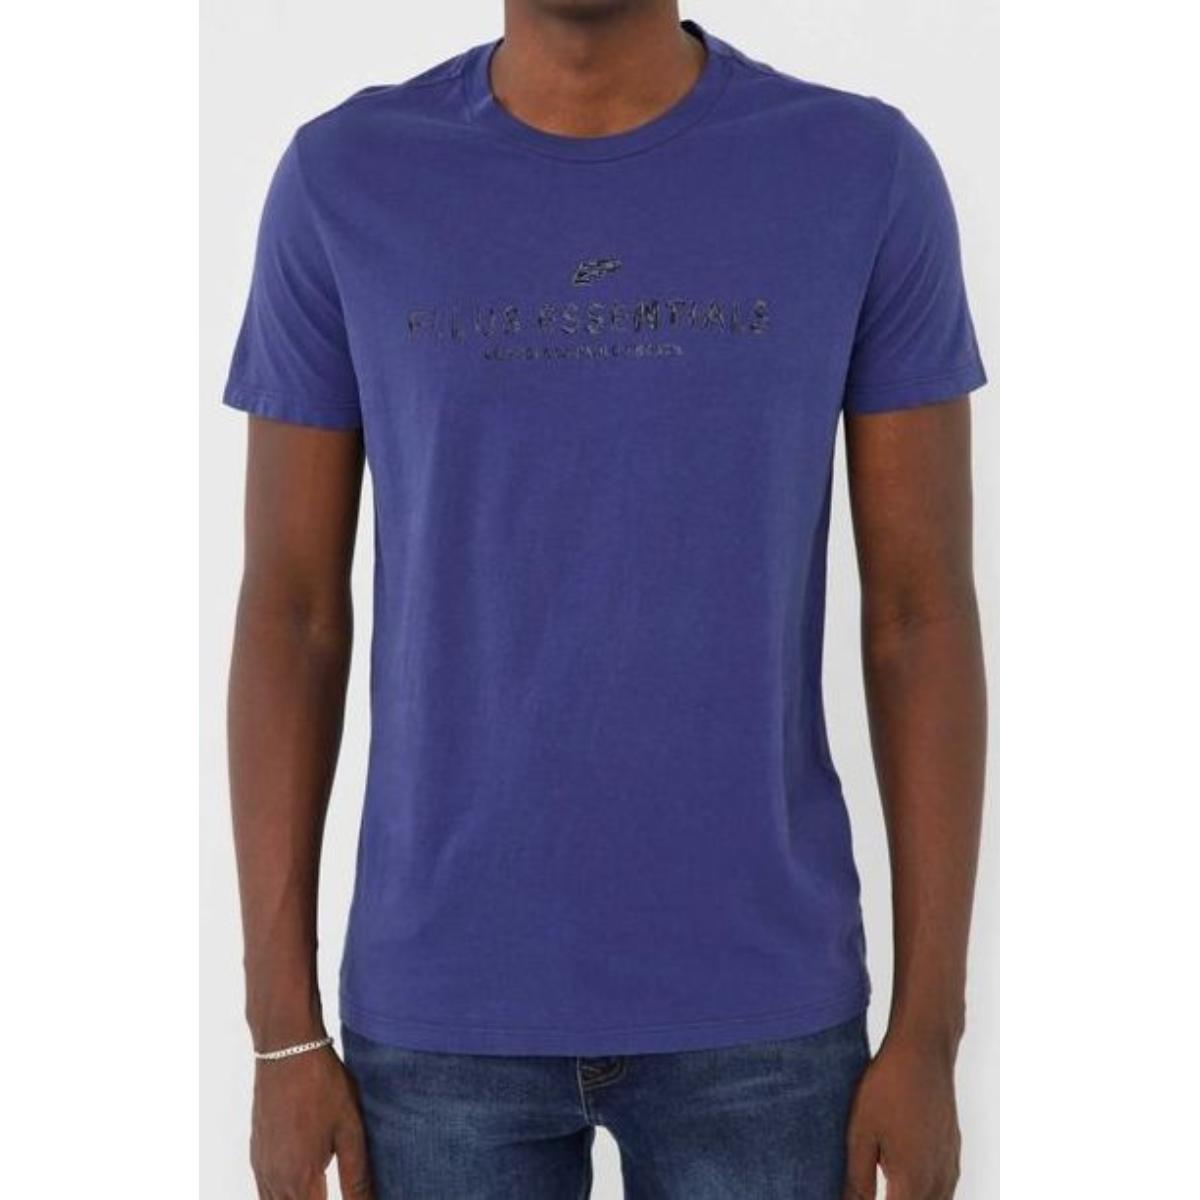 T-shirt Masculino Ellus 53c5818 74 Marinho